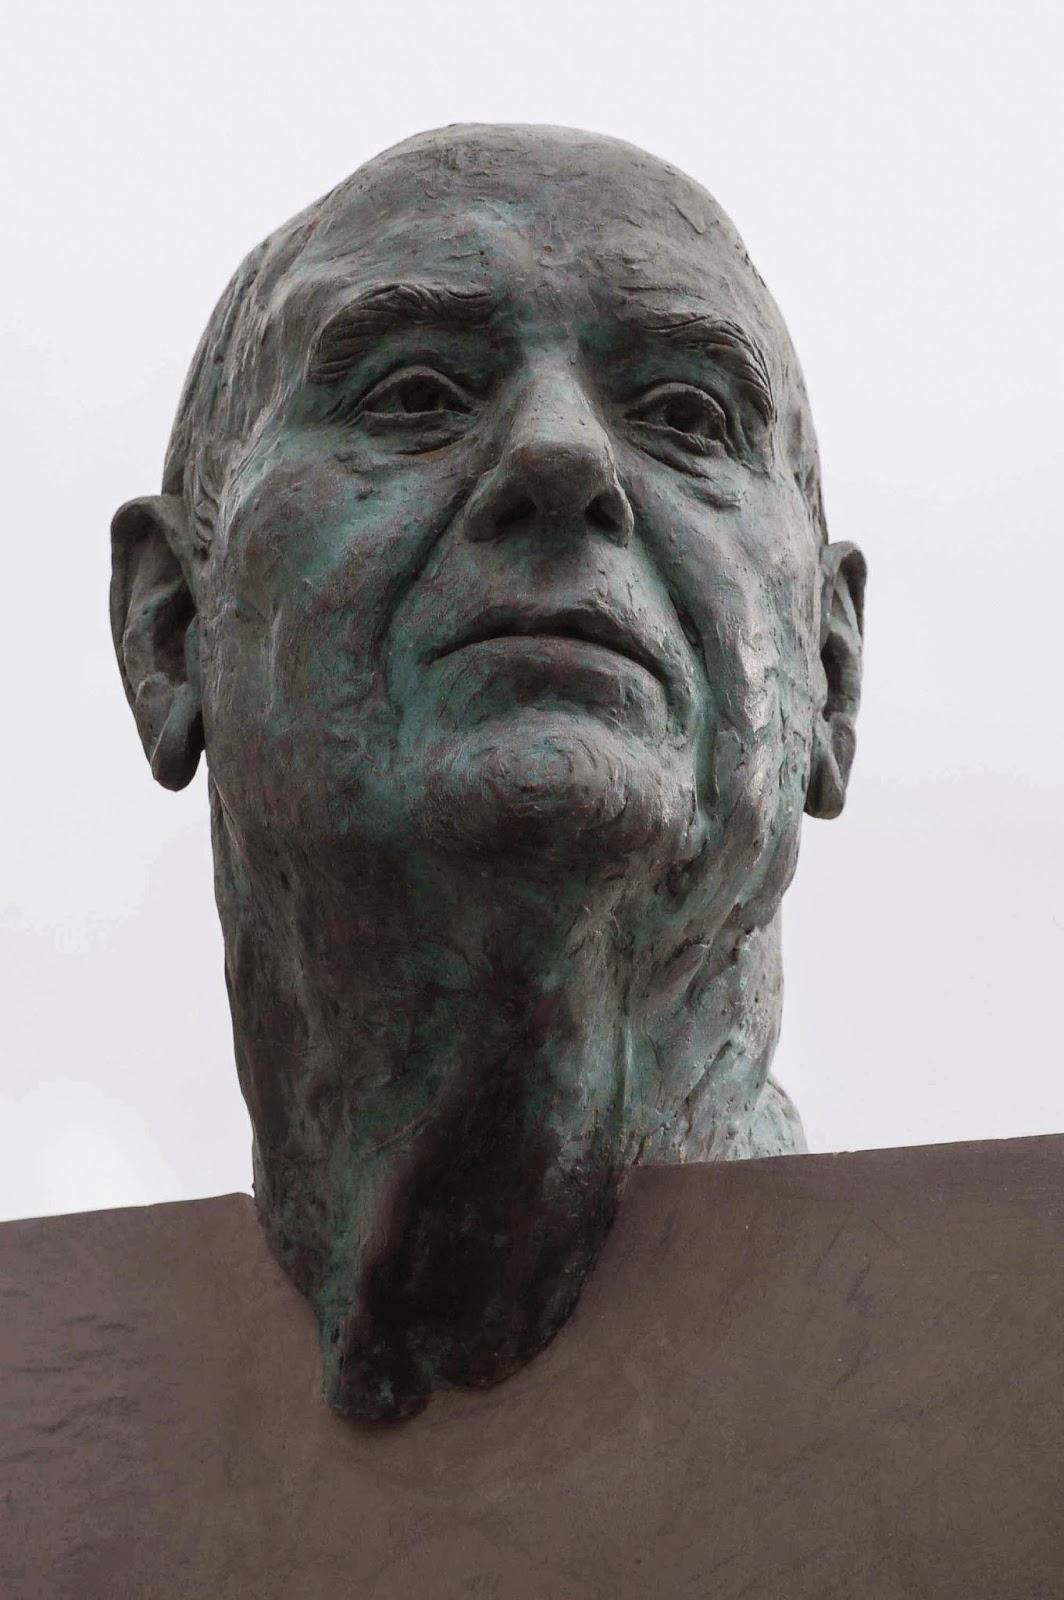 Monumento bronce Fuente Álamo Murcia Arturo Serra escultura 1